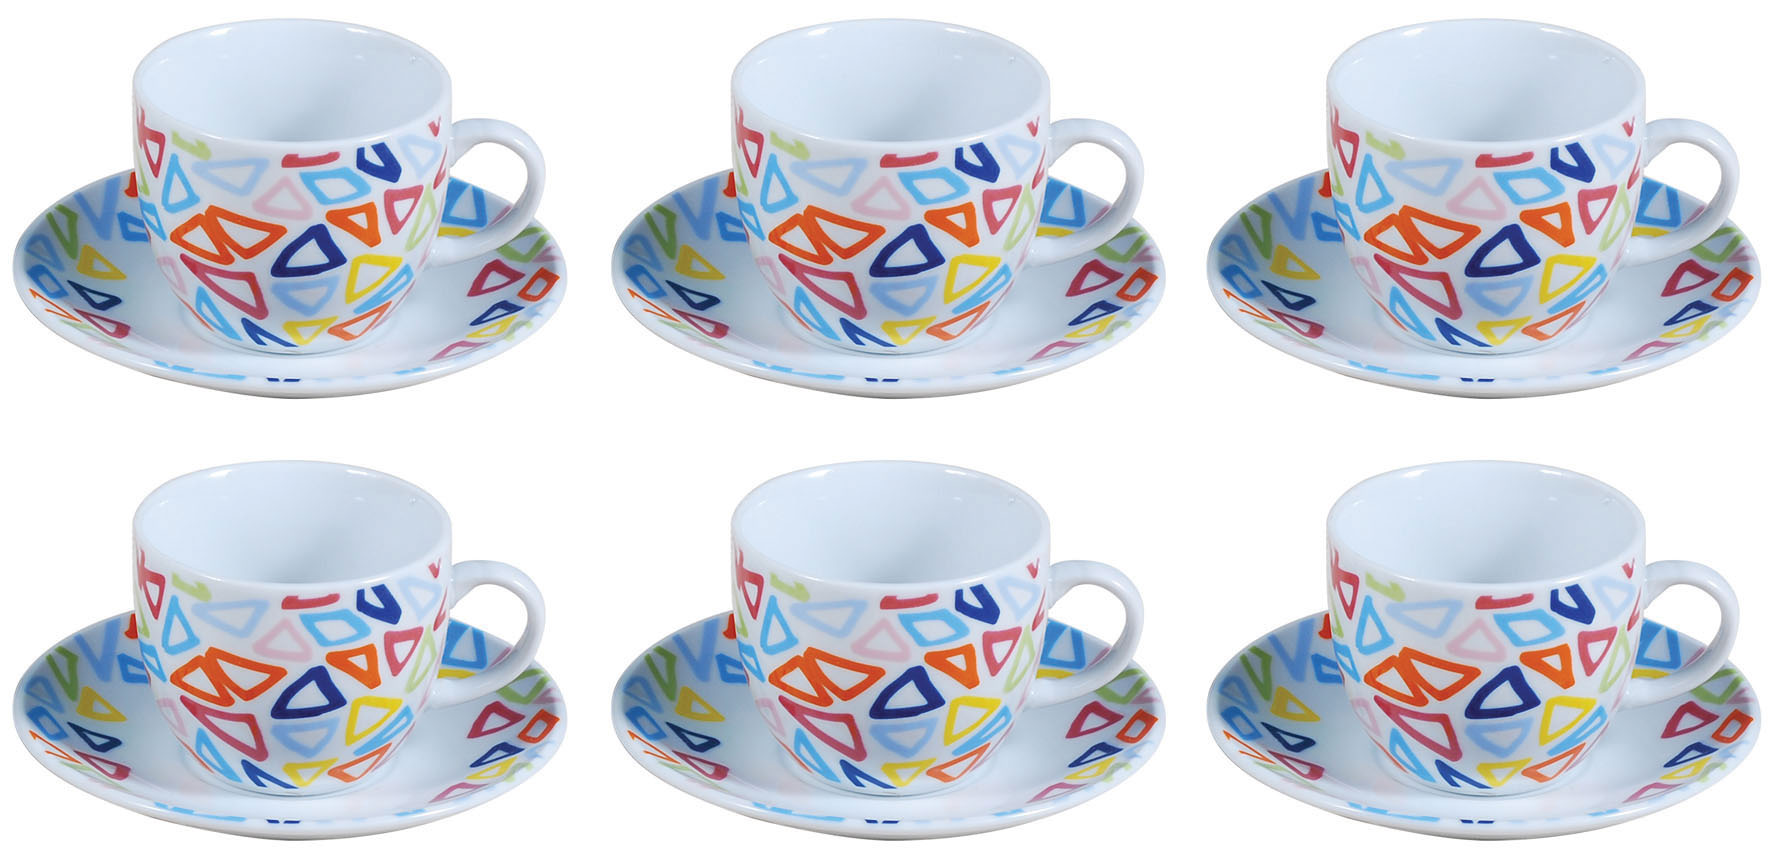 SERV CAFFE  PZ 6 C P LETIZIA